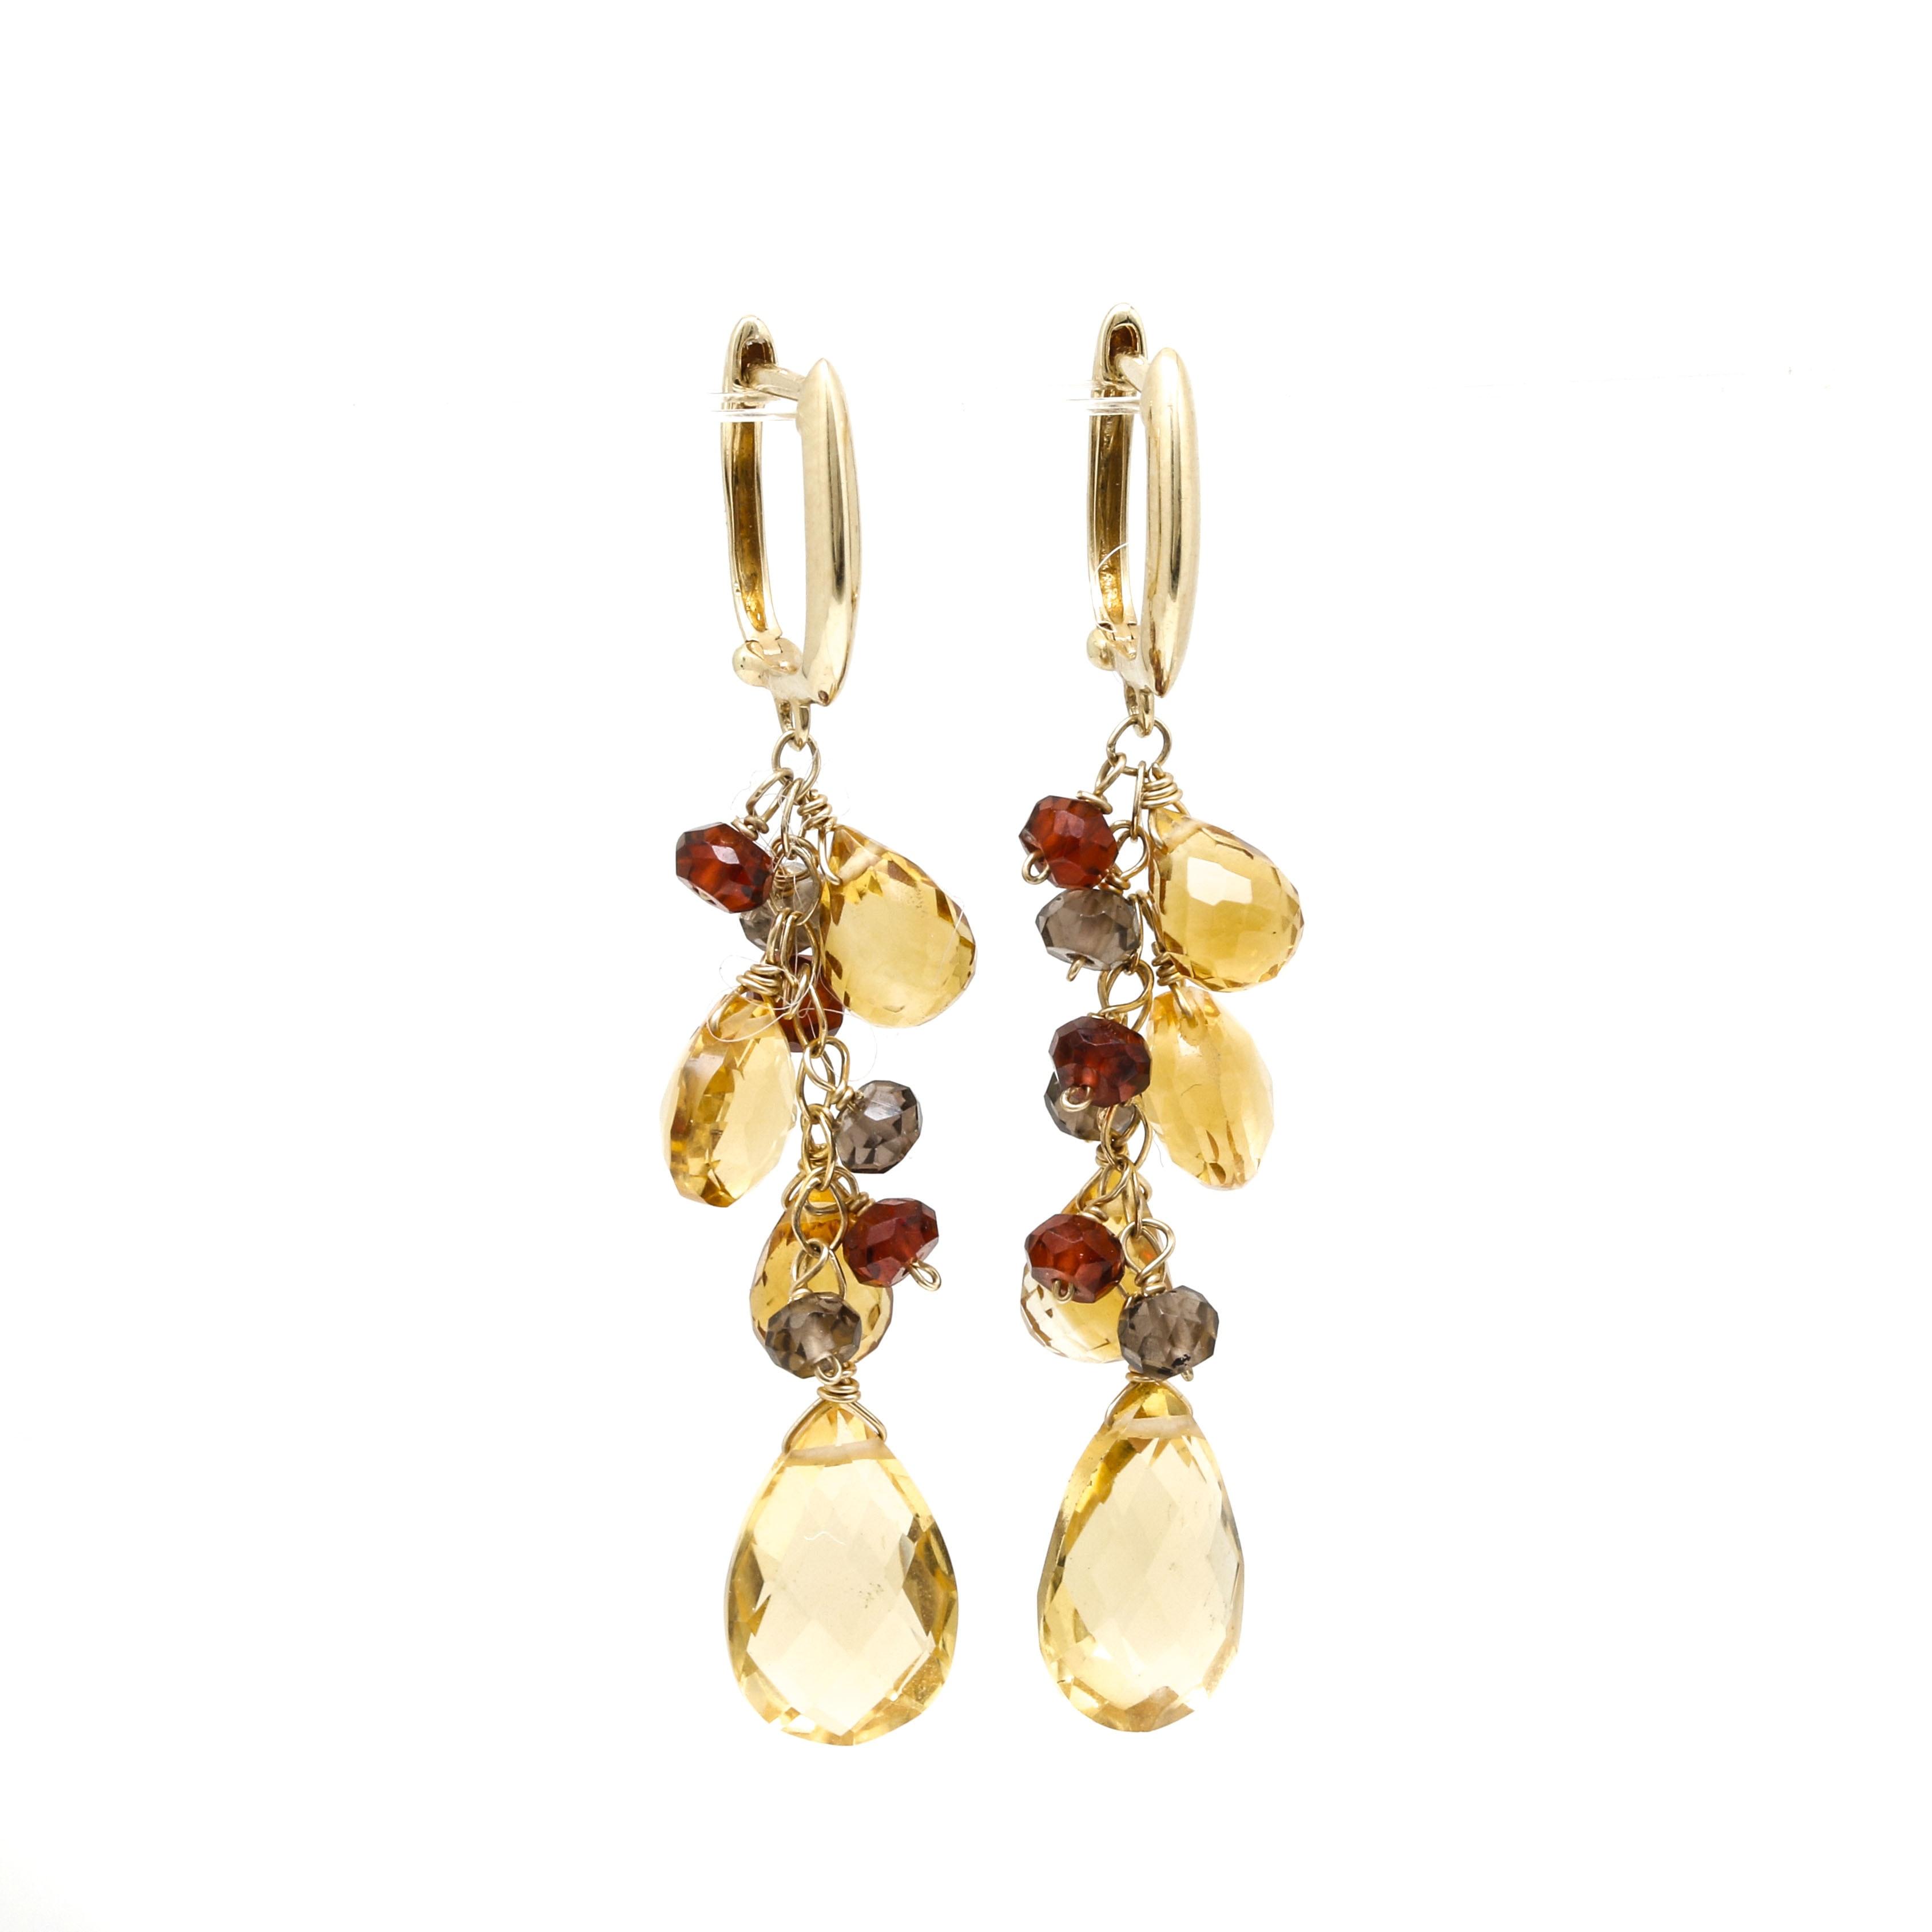 14K Yellow Gold Citrine and Smoky Quartz Drop Earrings